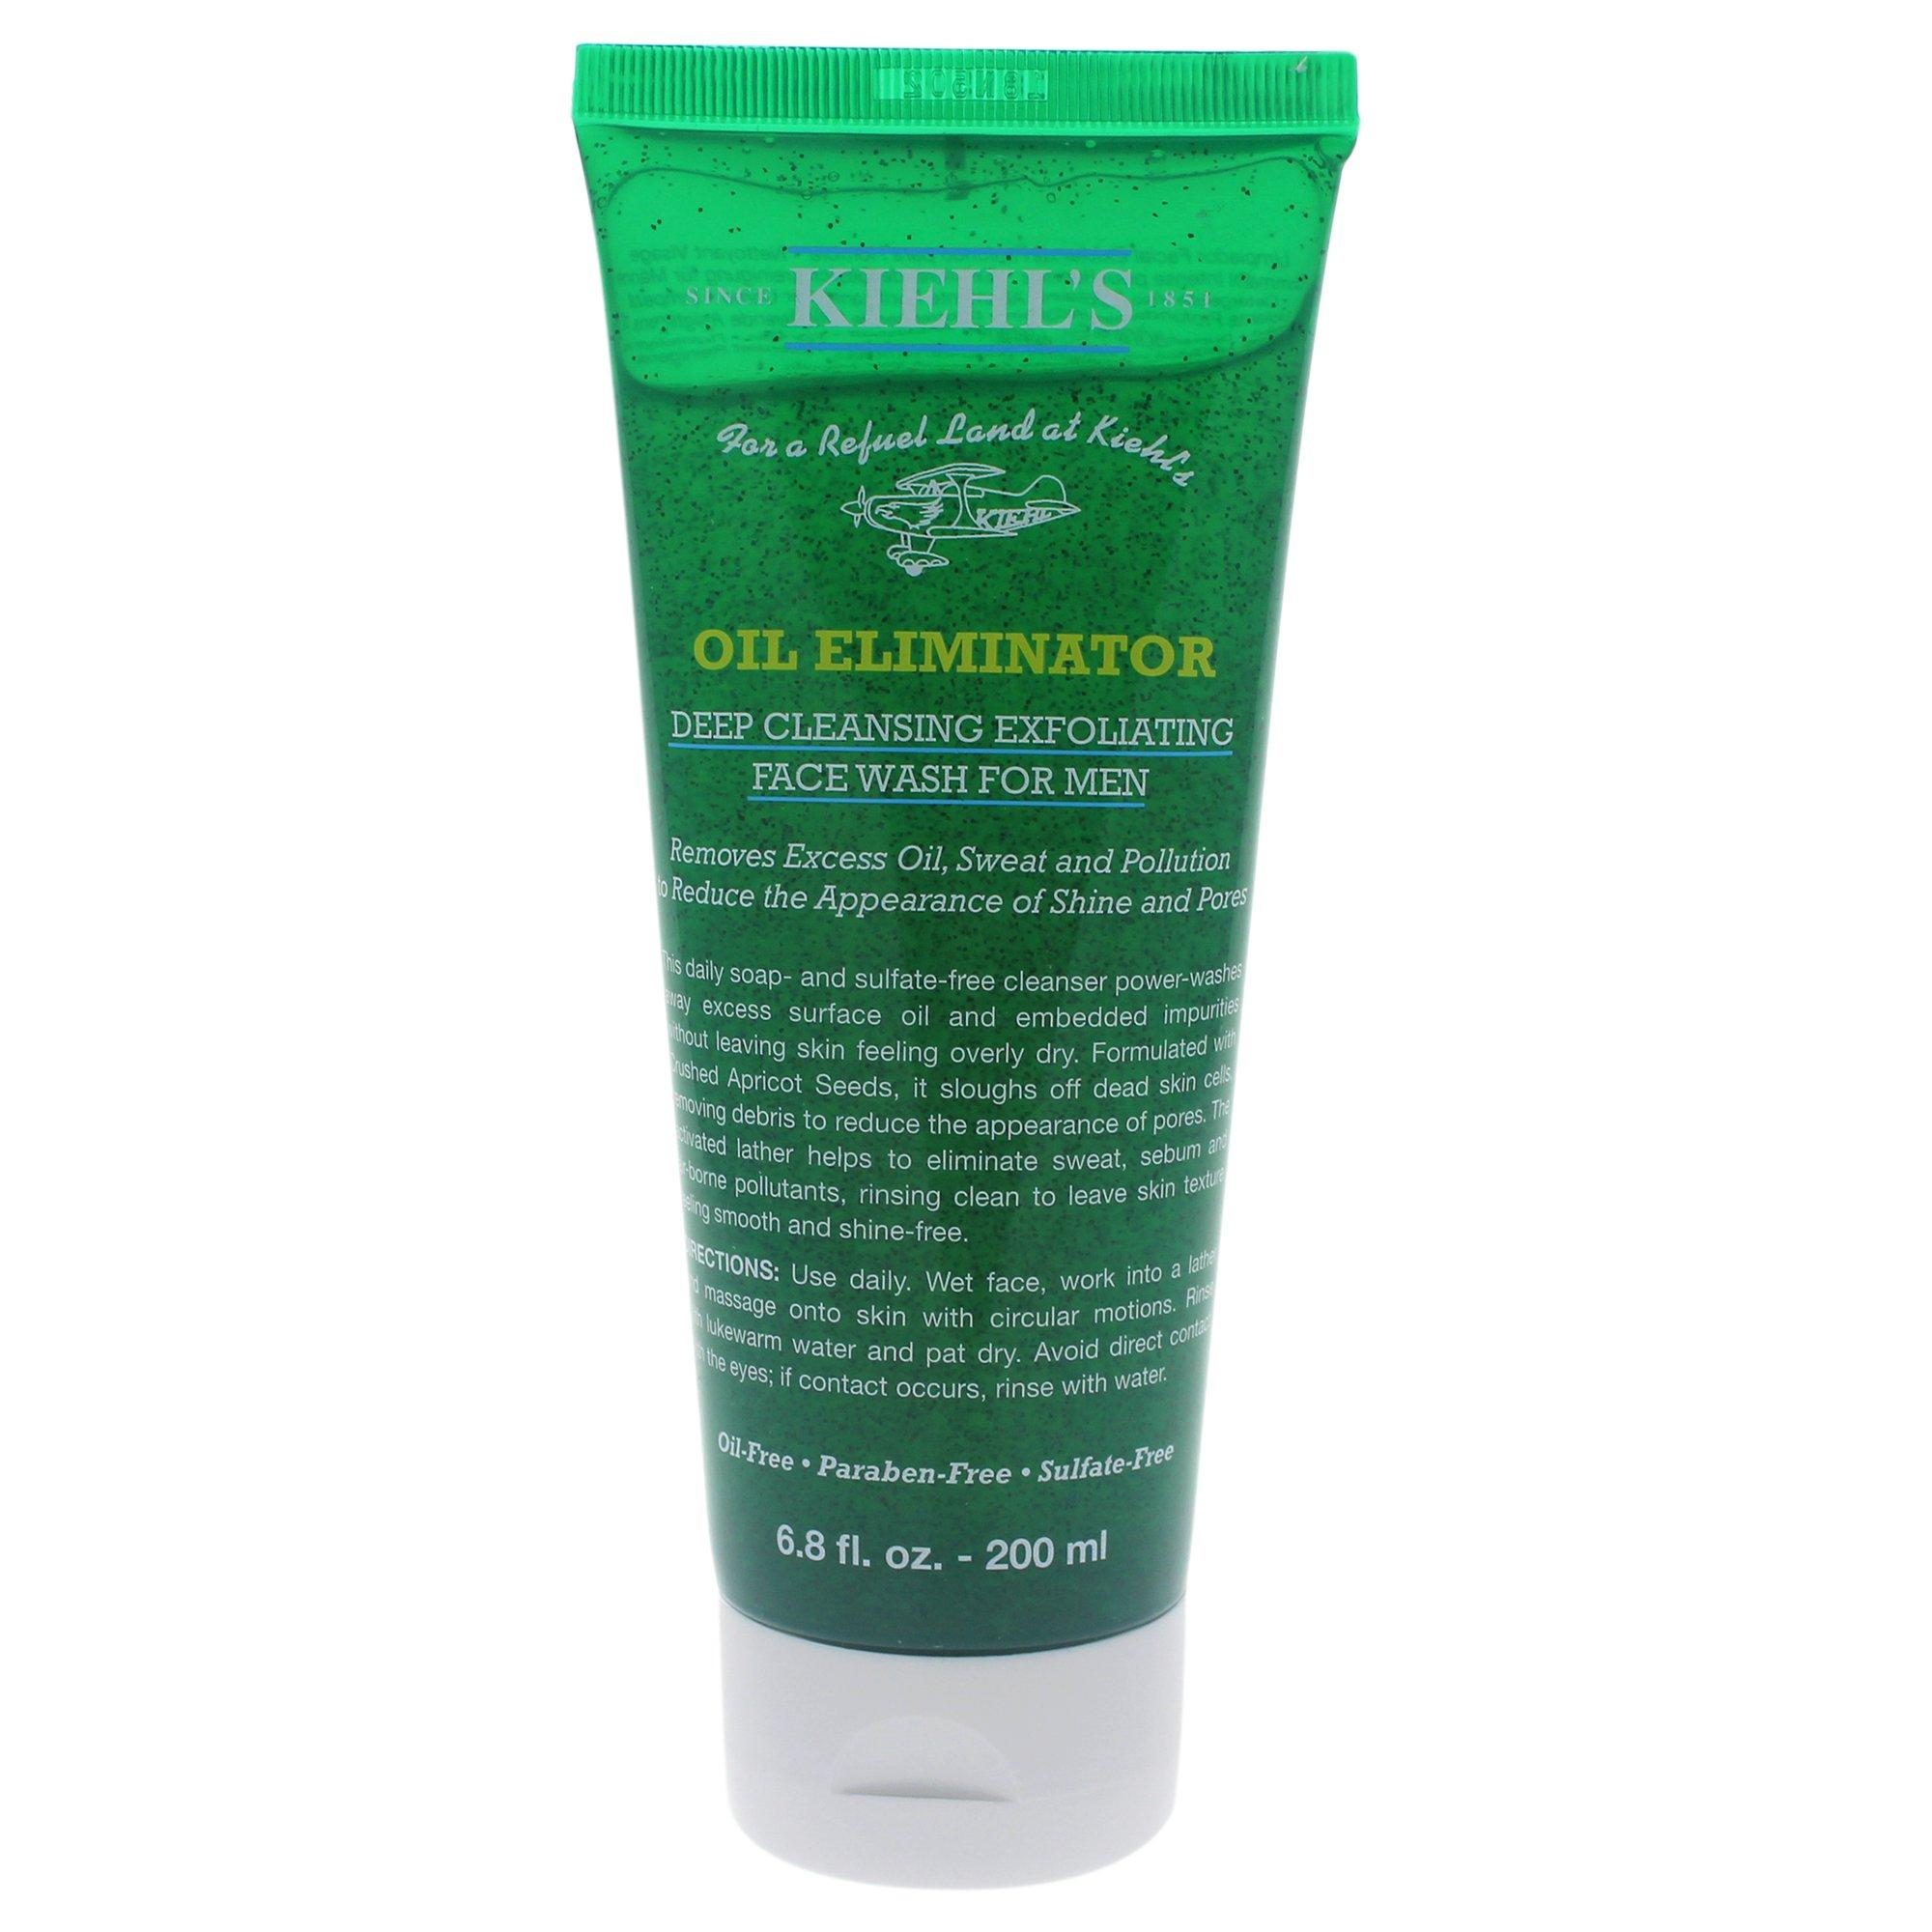 Kiehl's Men Oil Eliminator Deep Cleansing Exfoliating Face Wash 200 ml